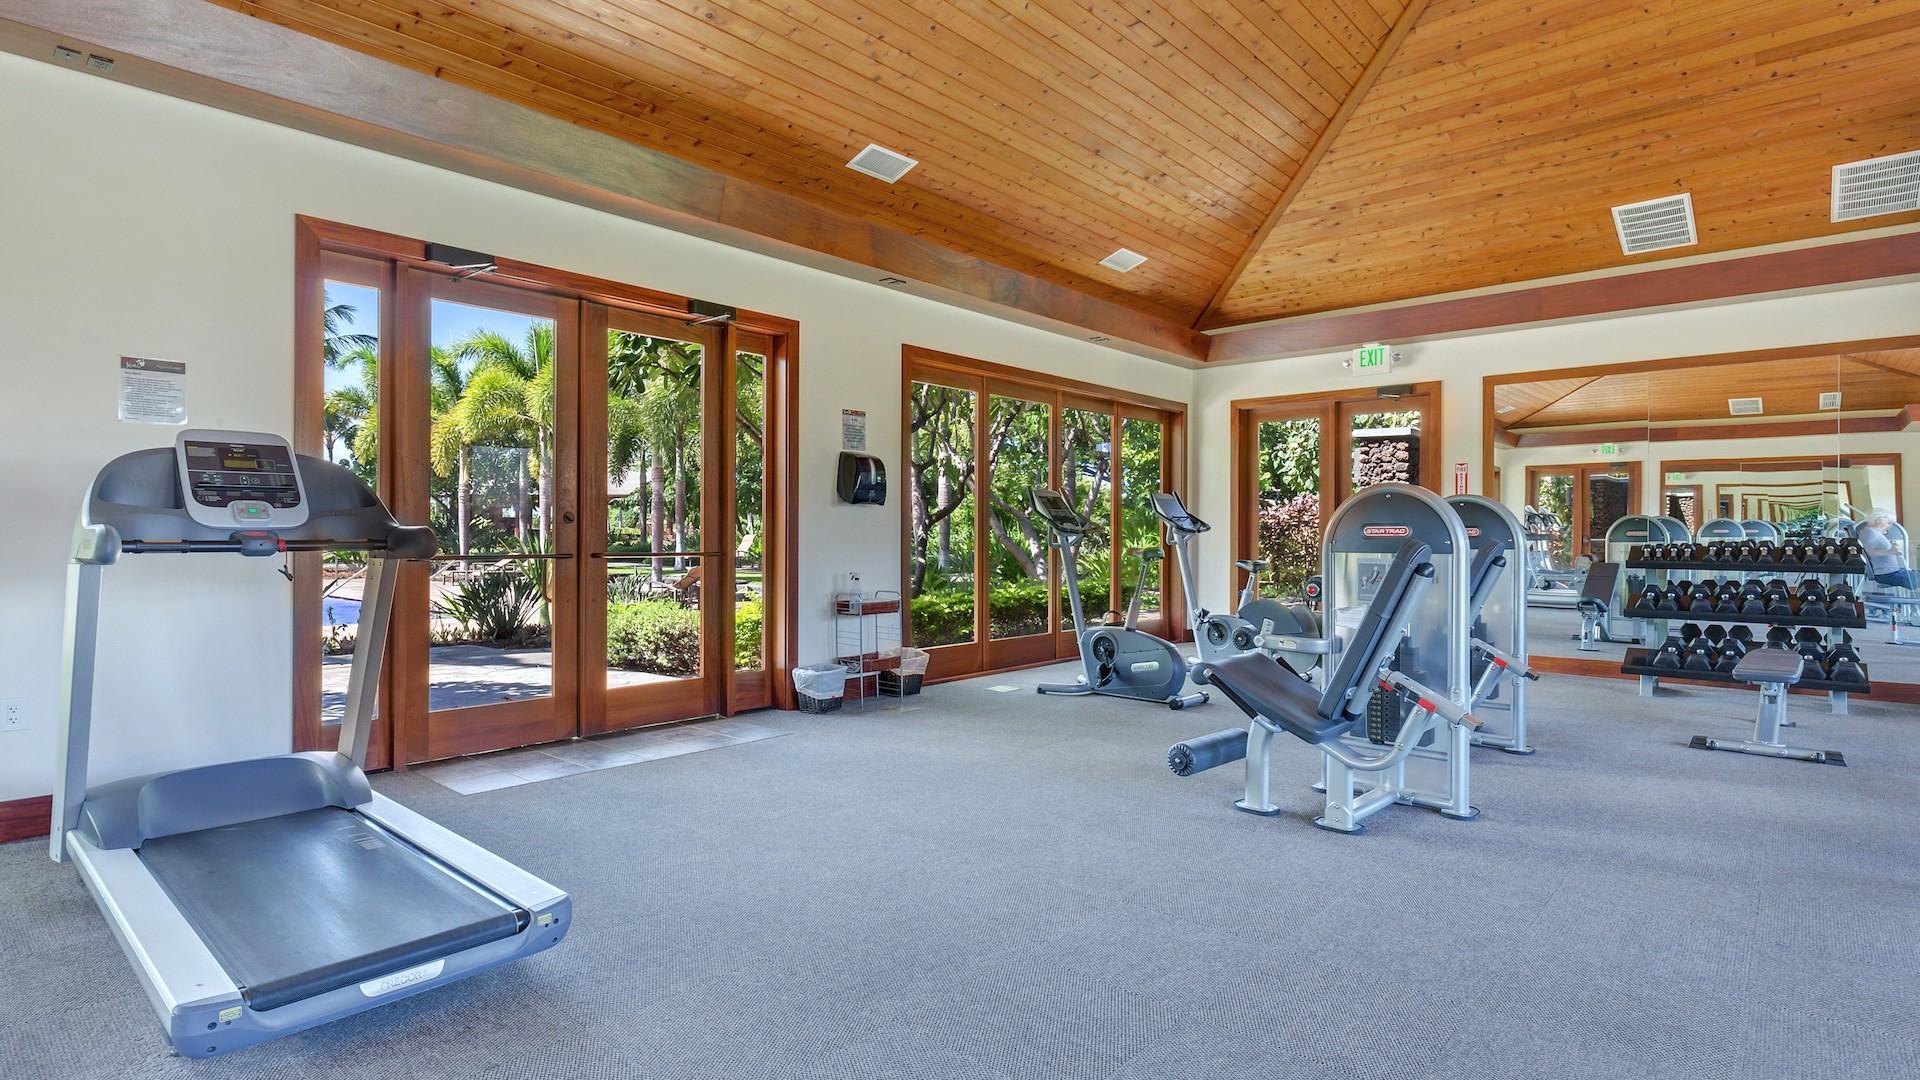 KaMilo recreation center's fitness room.